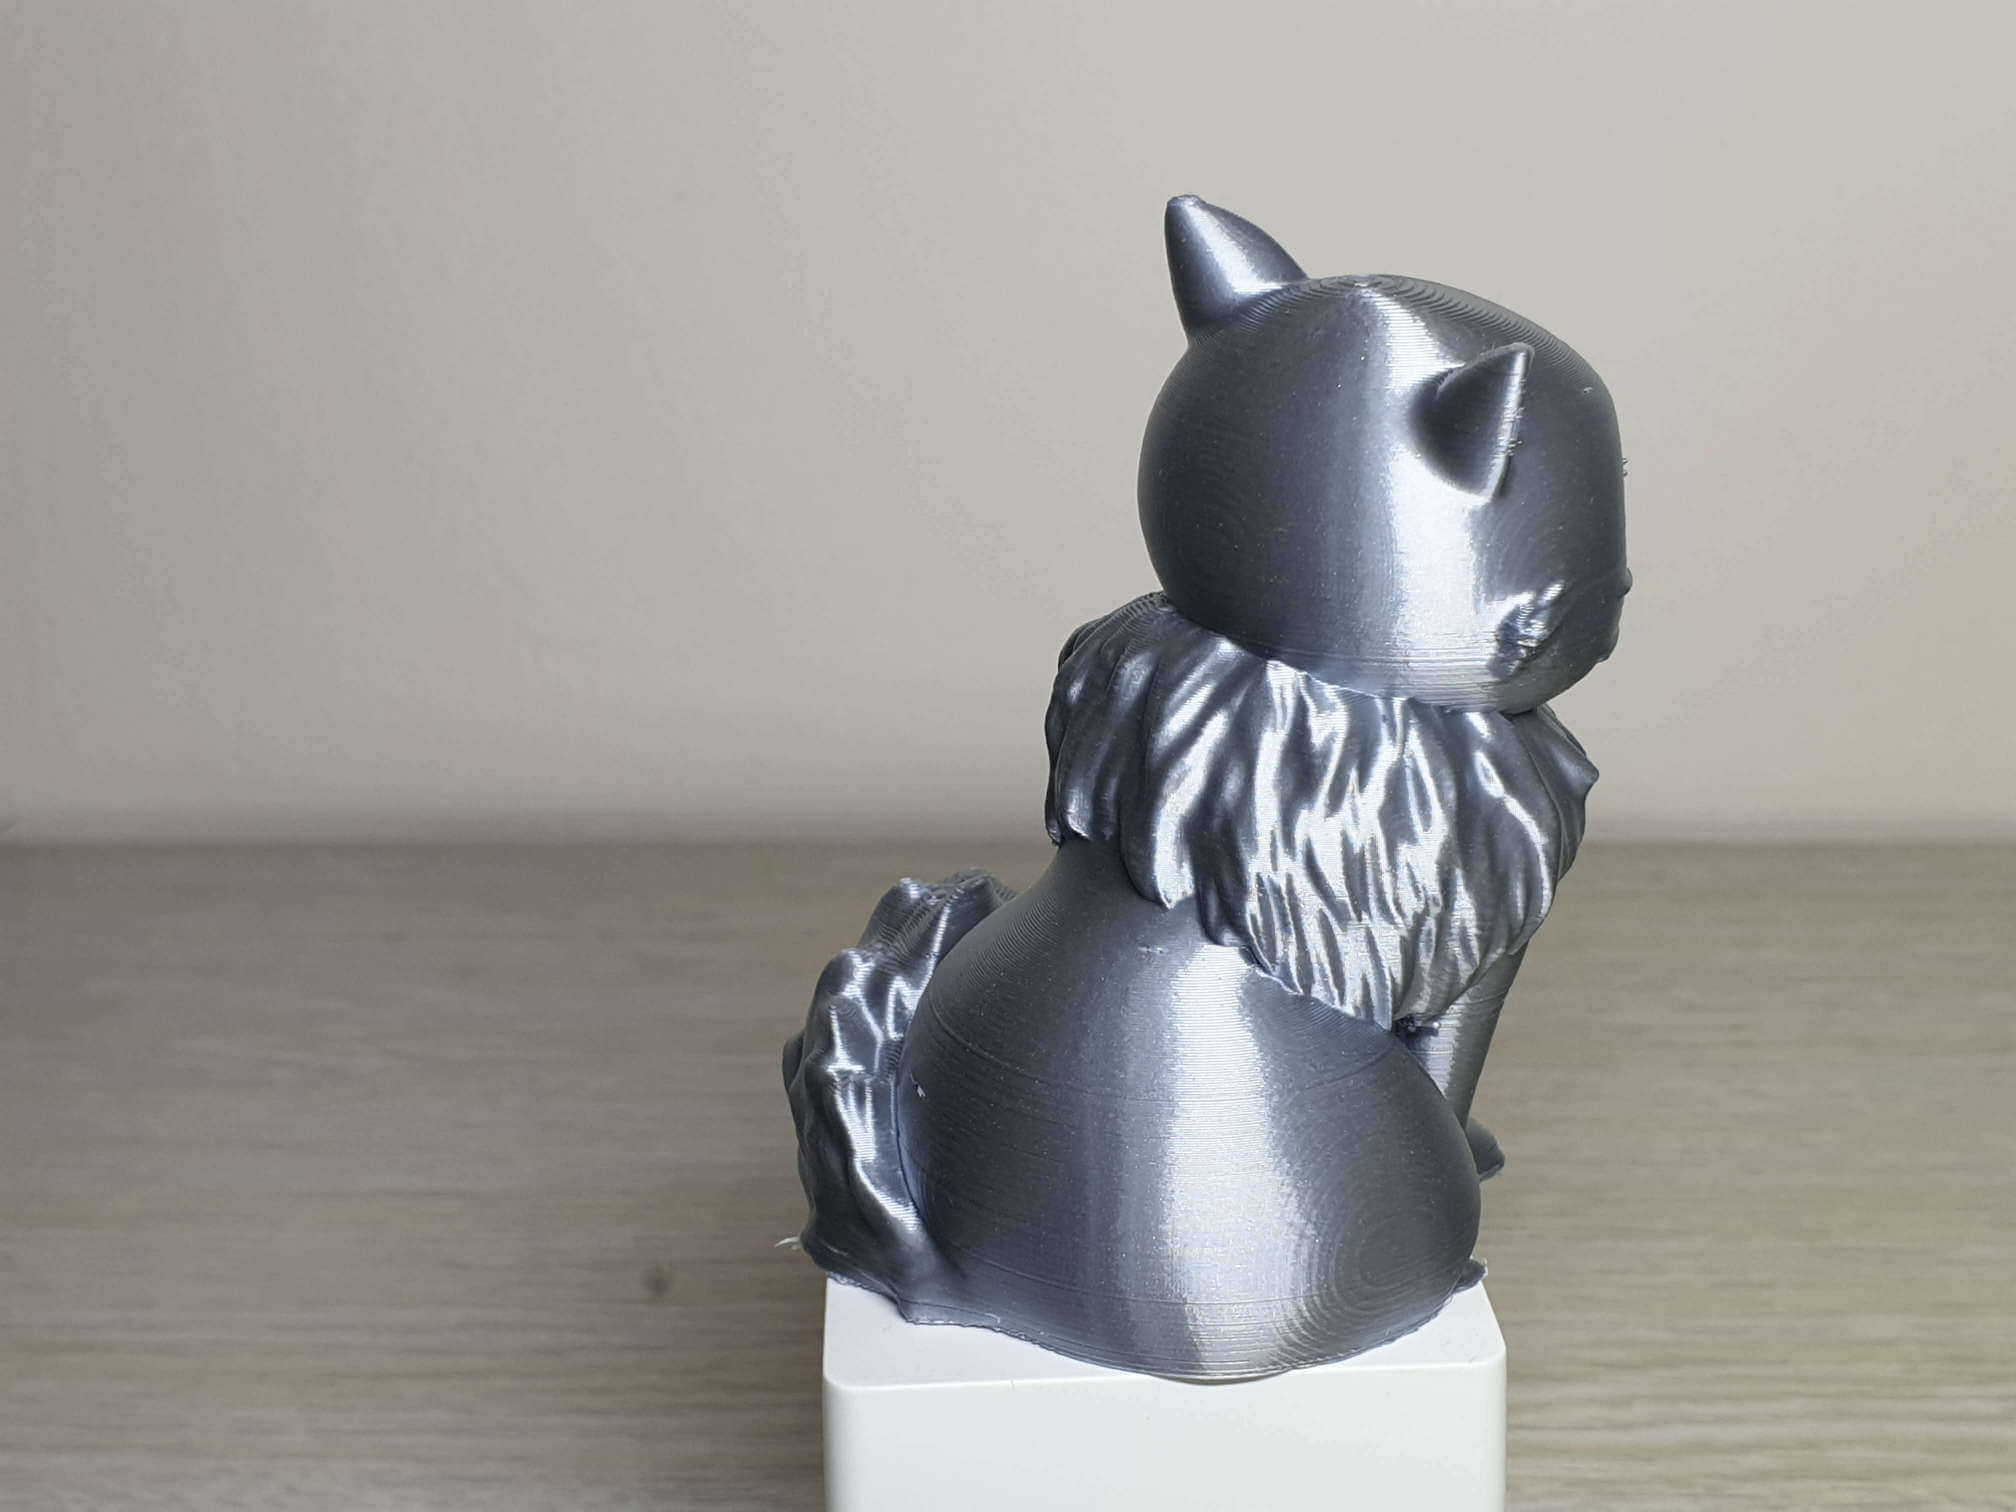 Lily printed on Longer Cube2 Mini 1 | Cube2 Mini Review - 3D Printer for Kids